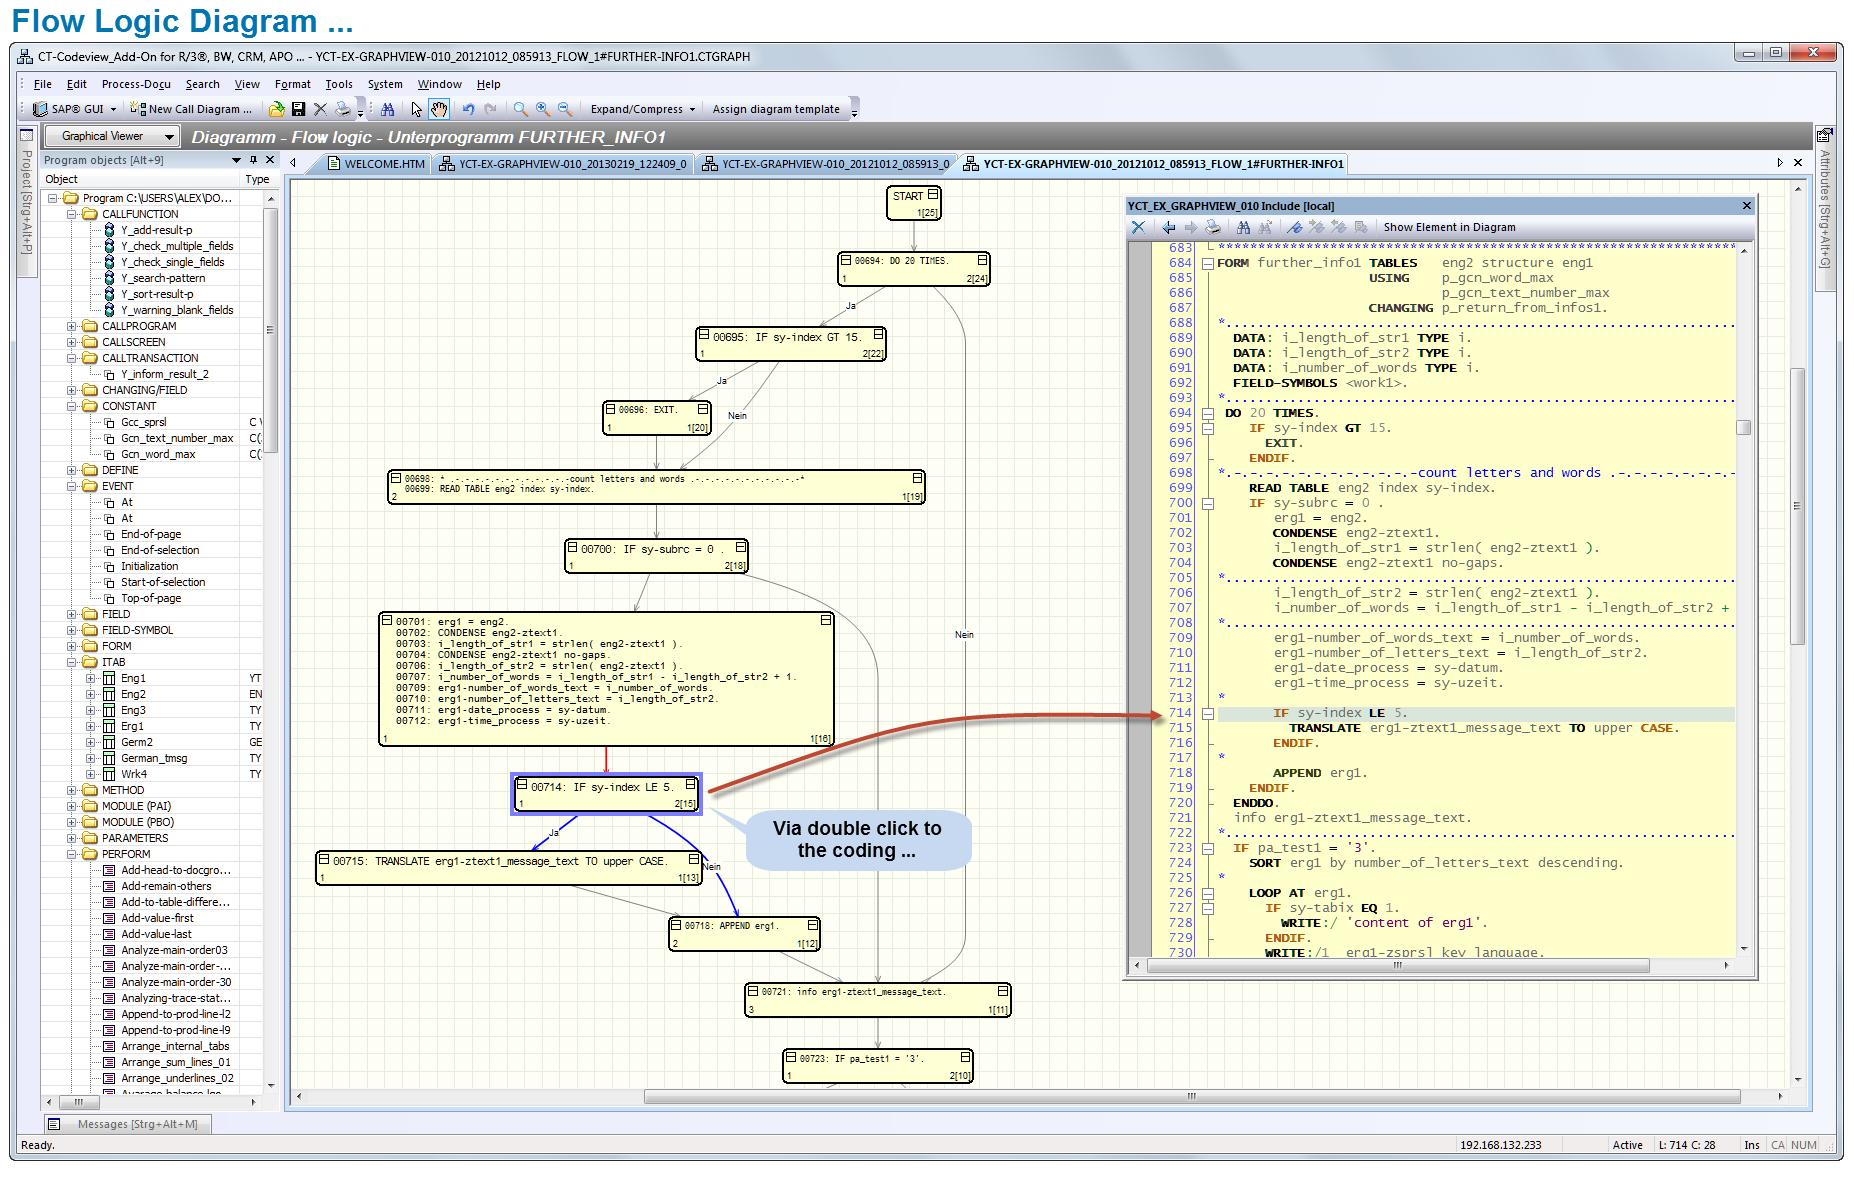 Ct software ct codeviewanalyzer 30 abap flow logic diagram pooptronica Choice Image